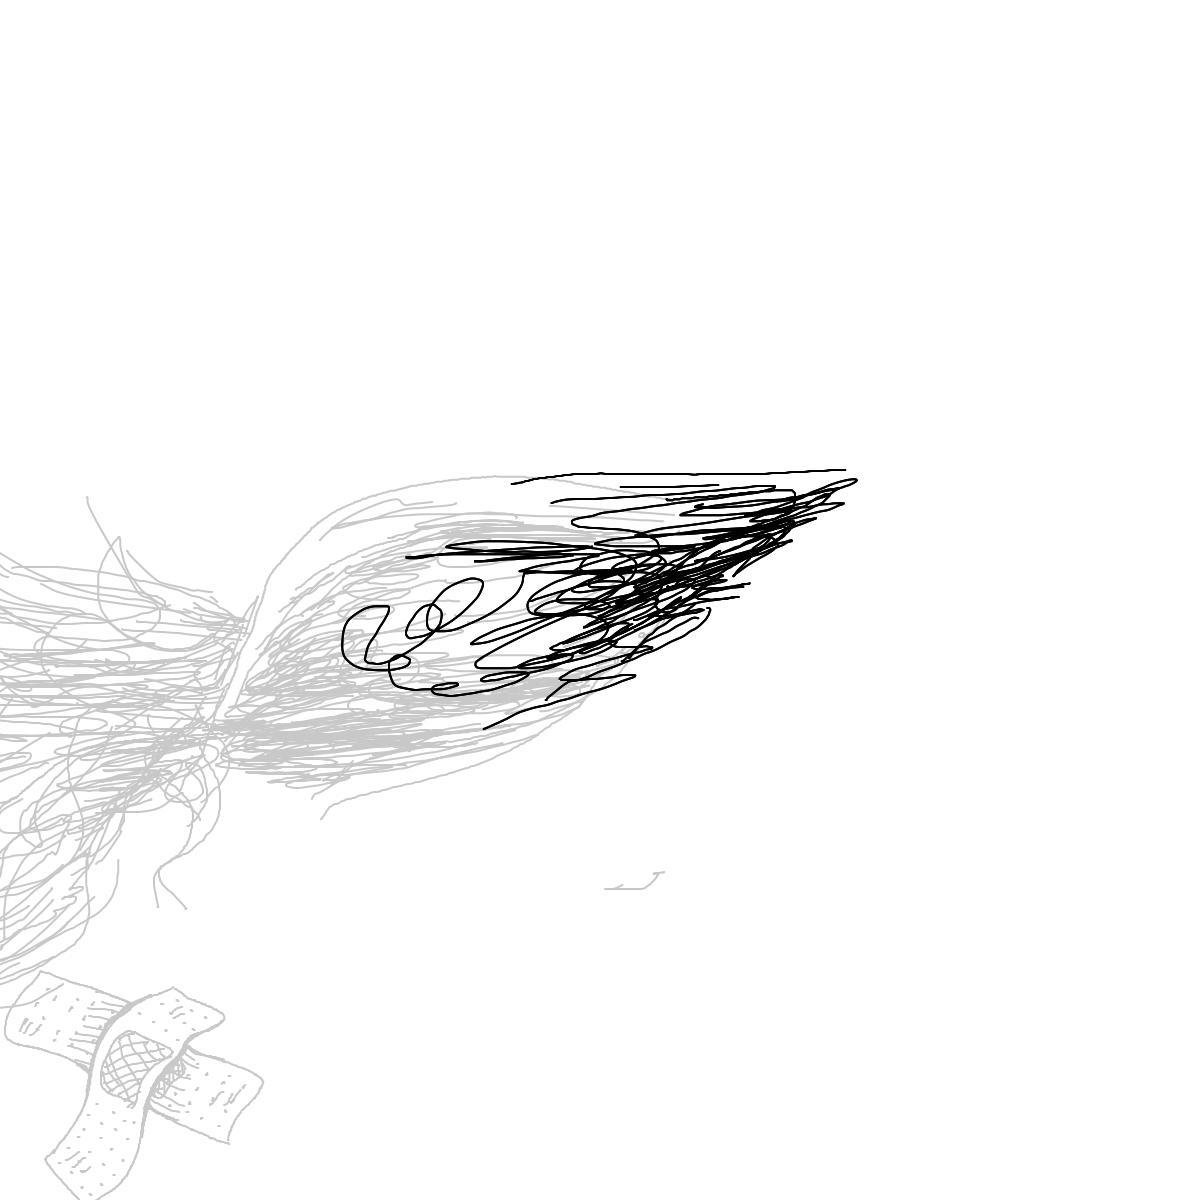 BAAAM drawing#24311 lat:35.7307624816894500lng: 51.3758010864257800